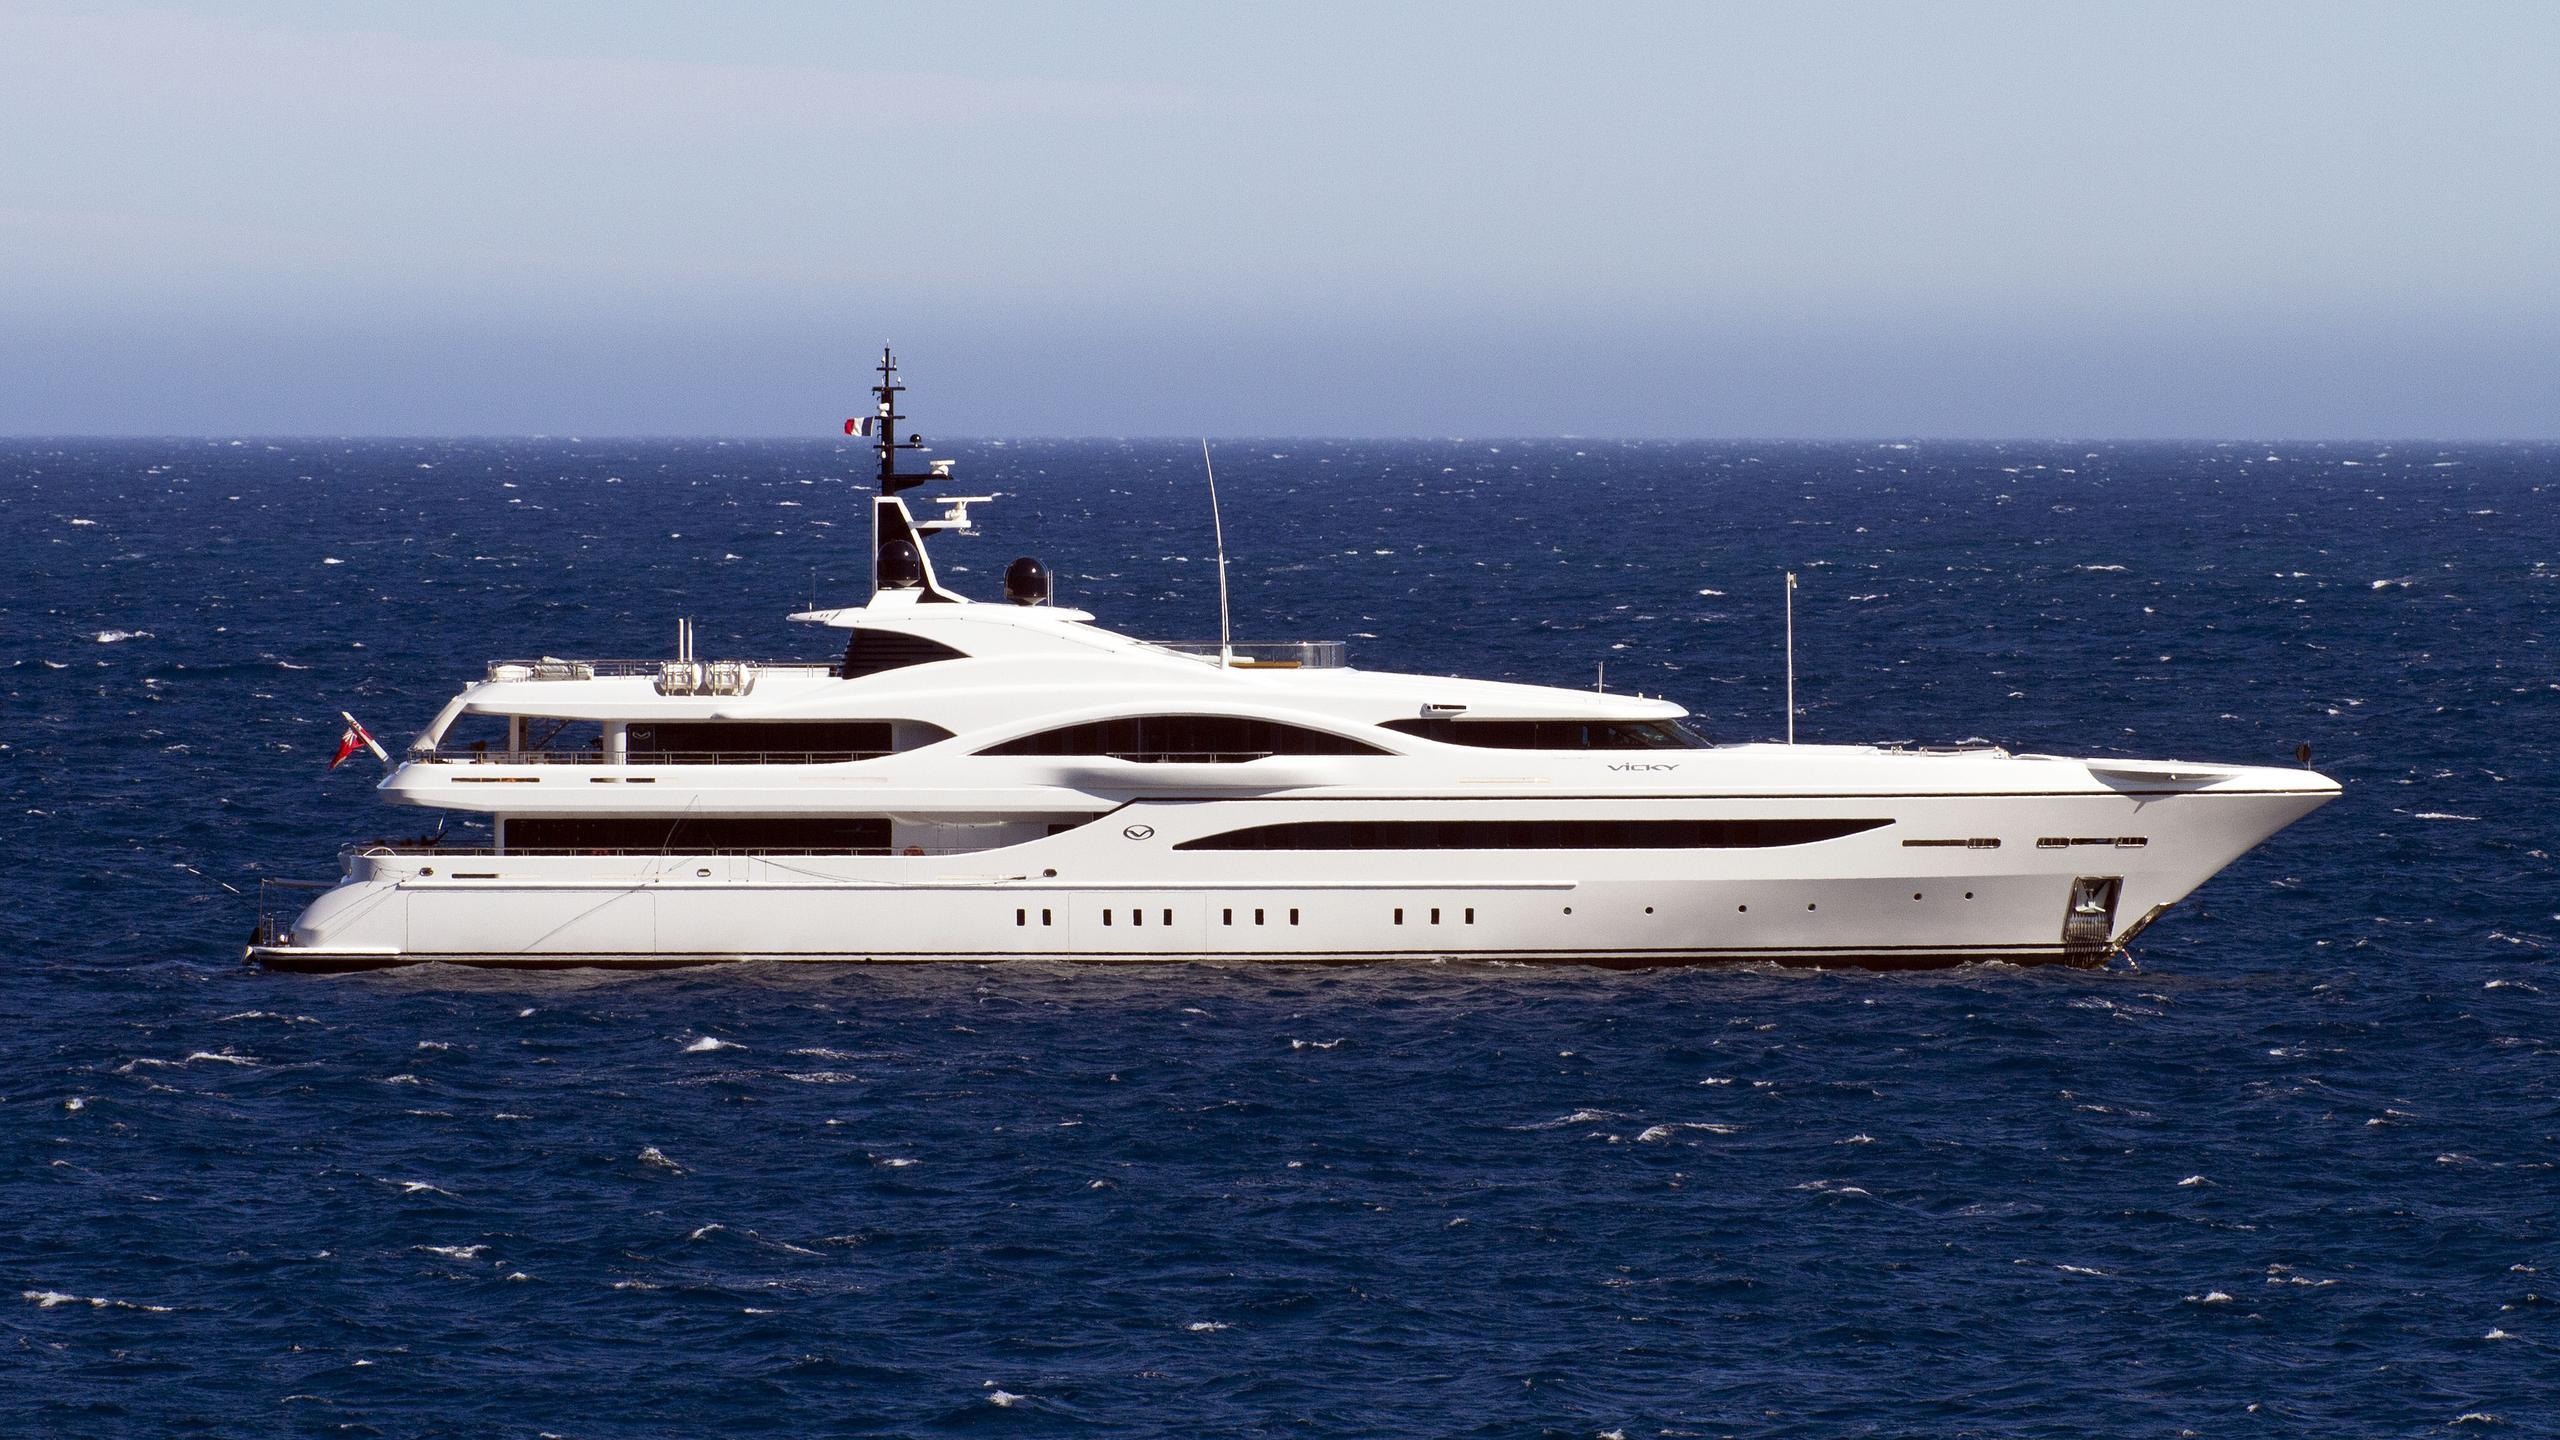 Vicky-motor-yacht-turquoise-2012-73m-profile